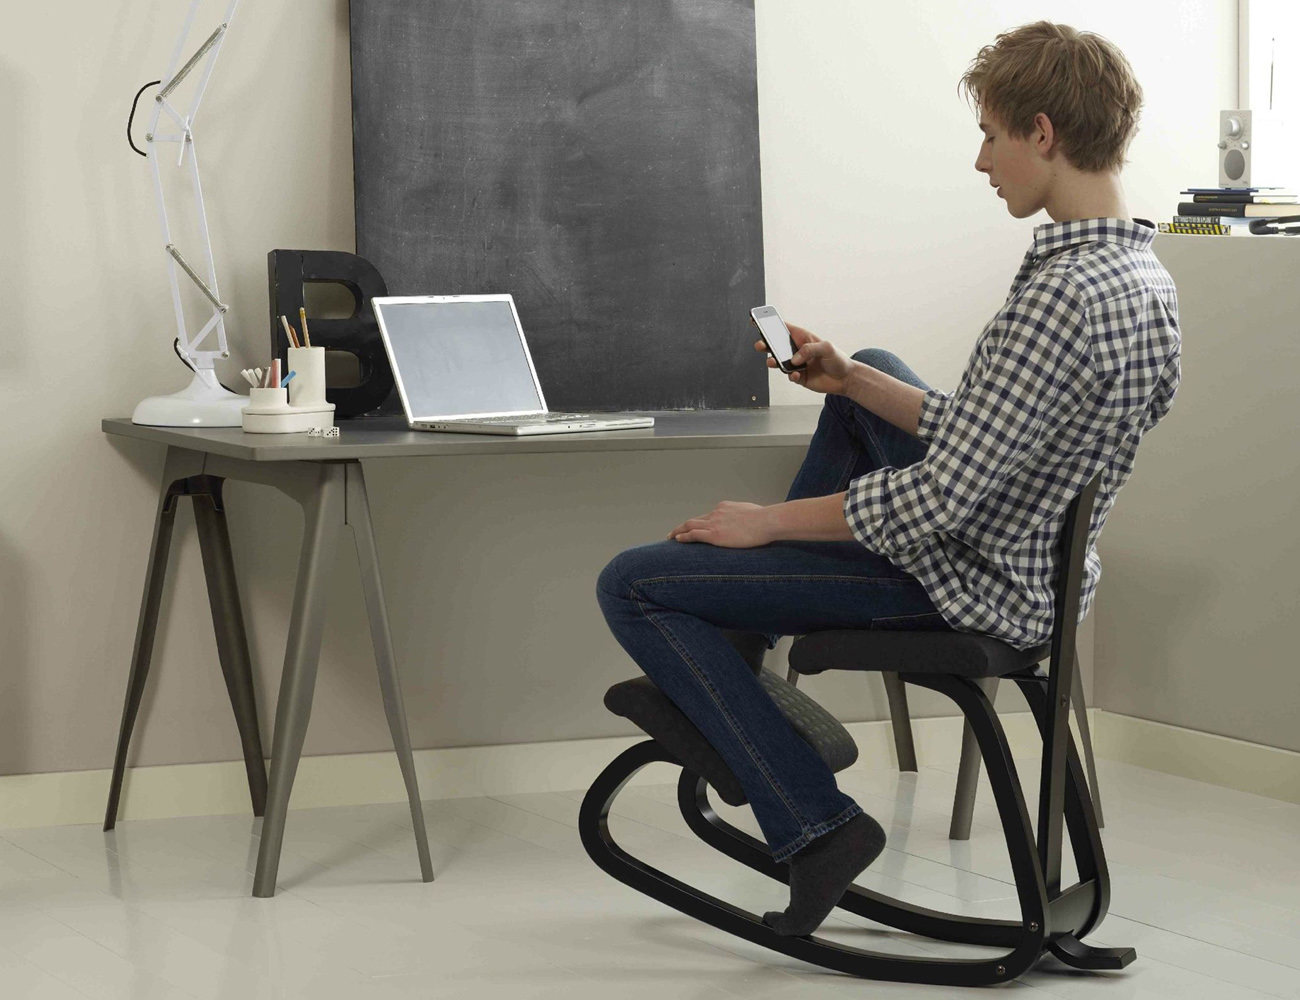 variable_balans_ergonomic_desk_chair_03